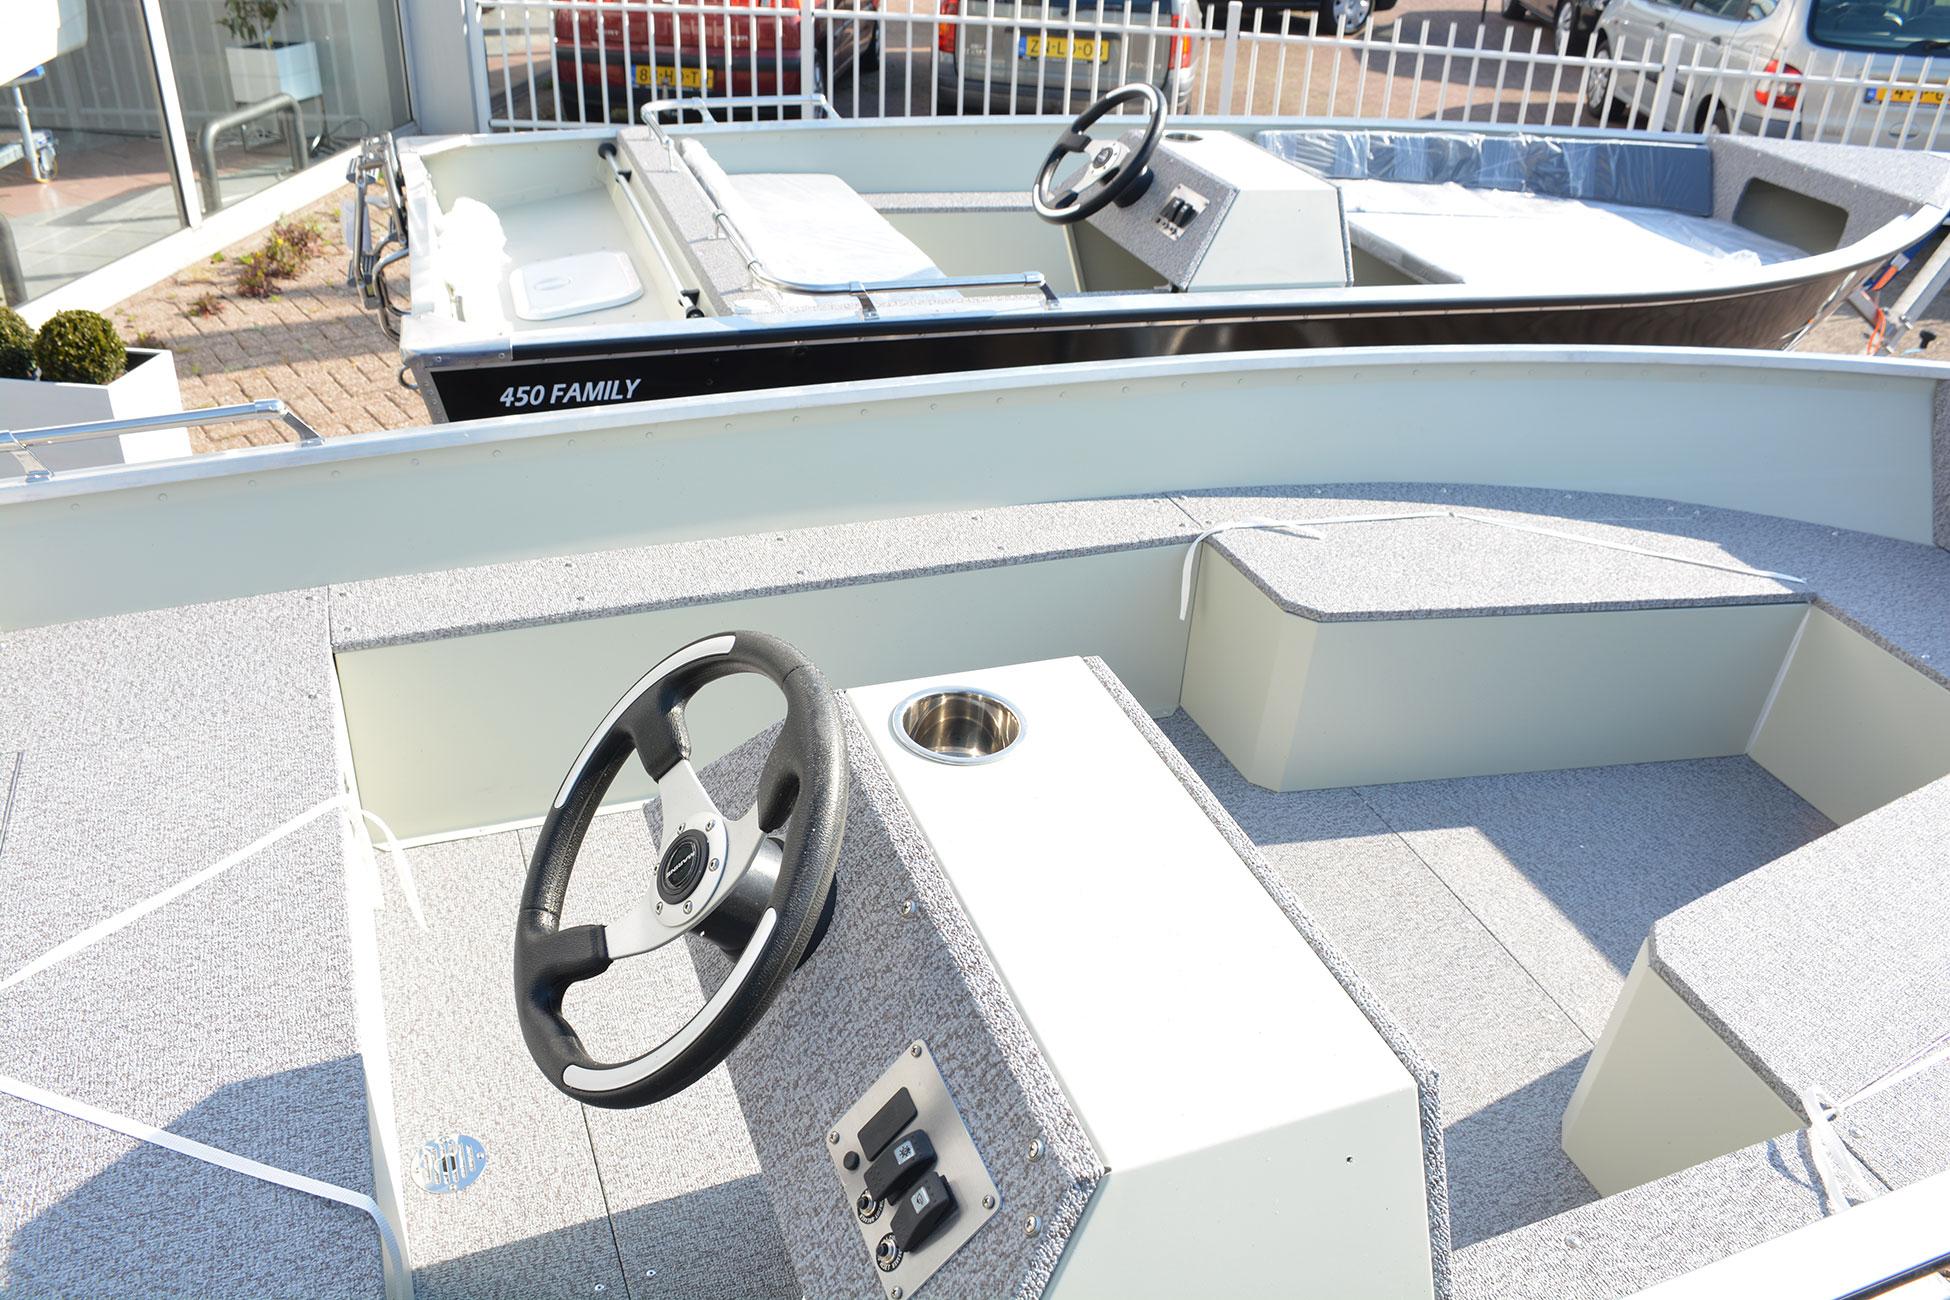 Fonkelnieuw Marine 450 Family Aluminium consoleboot kopen? JustMarine VS-35